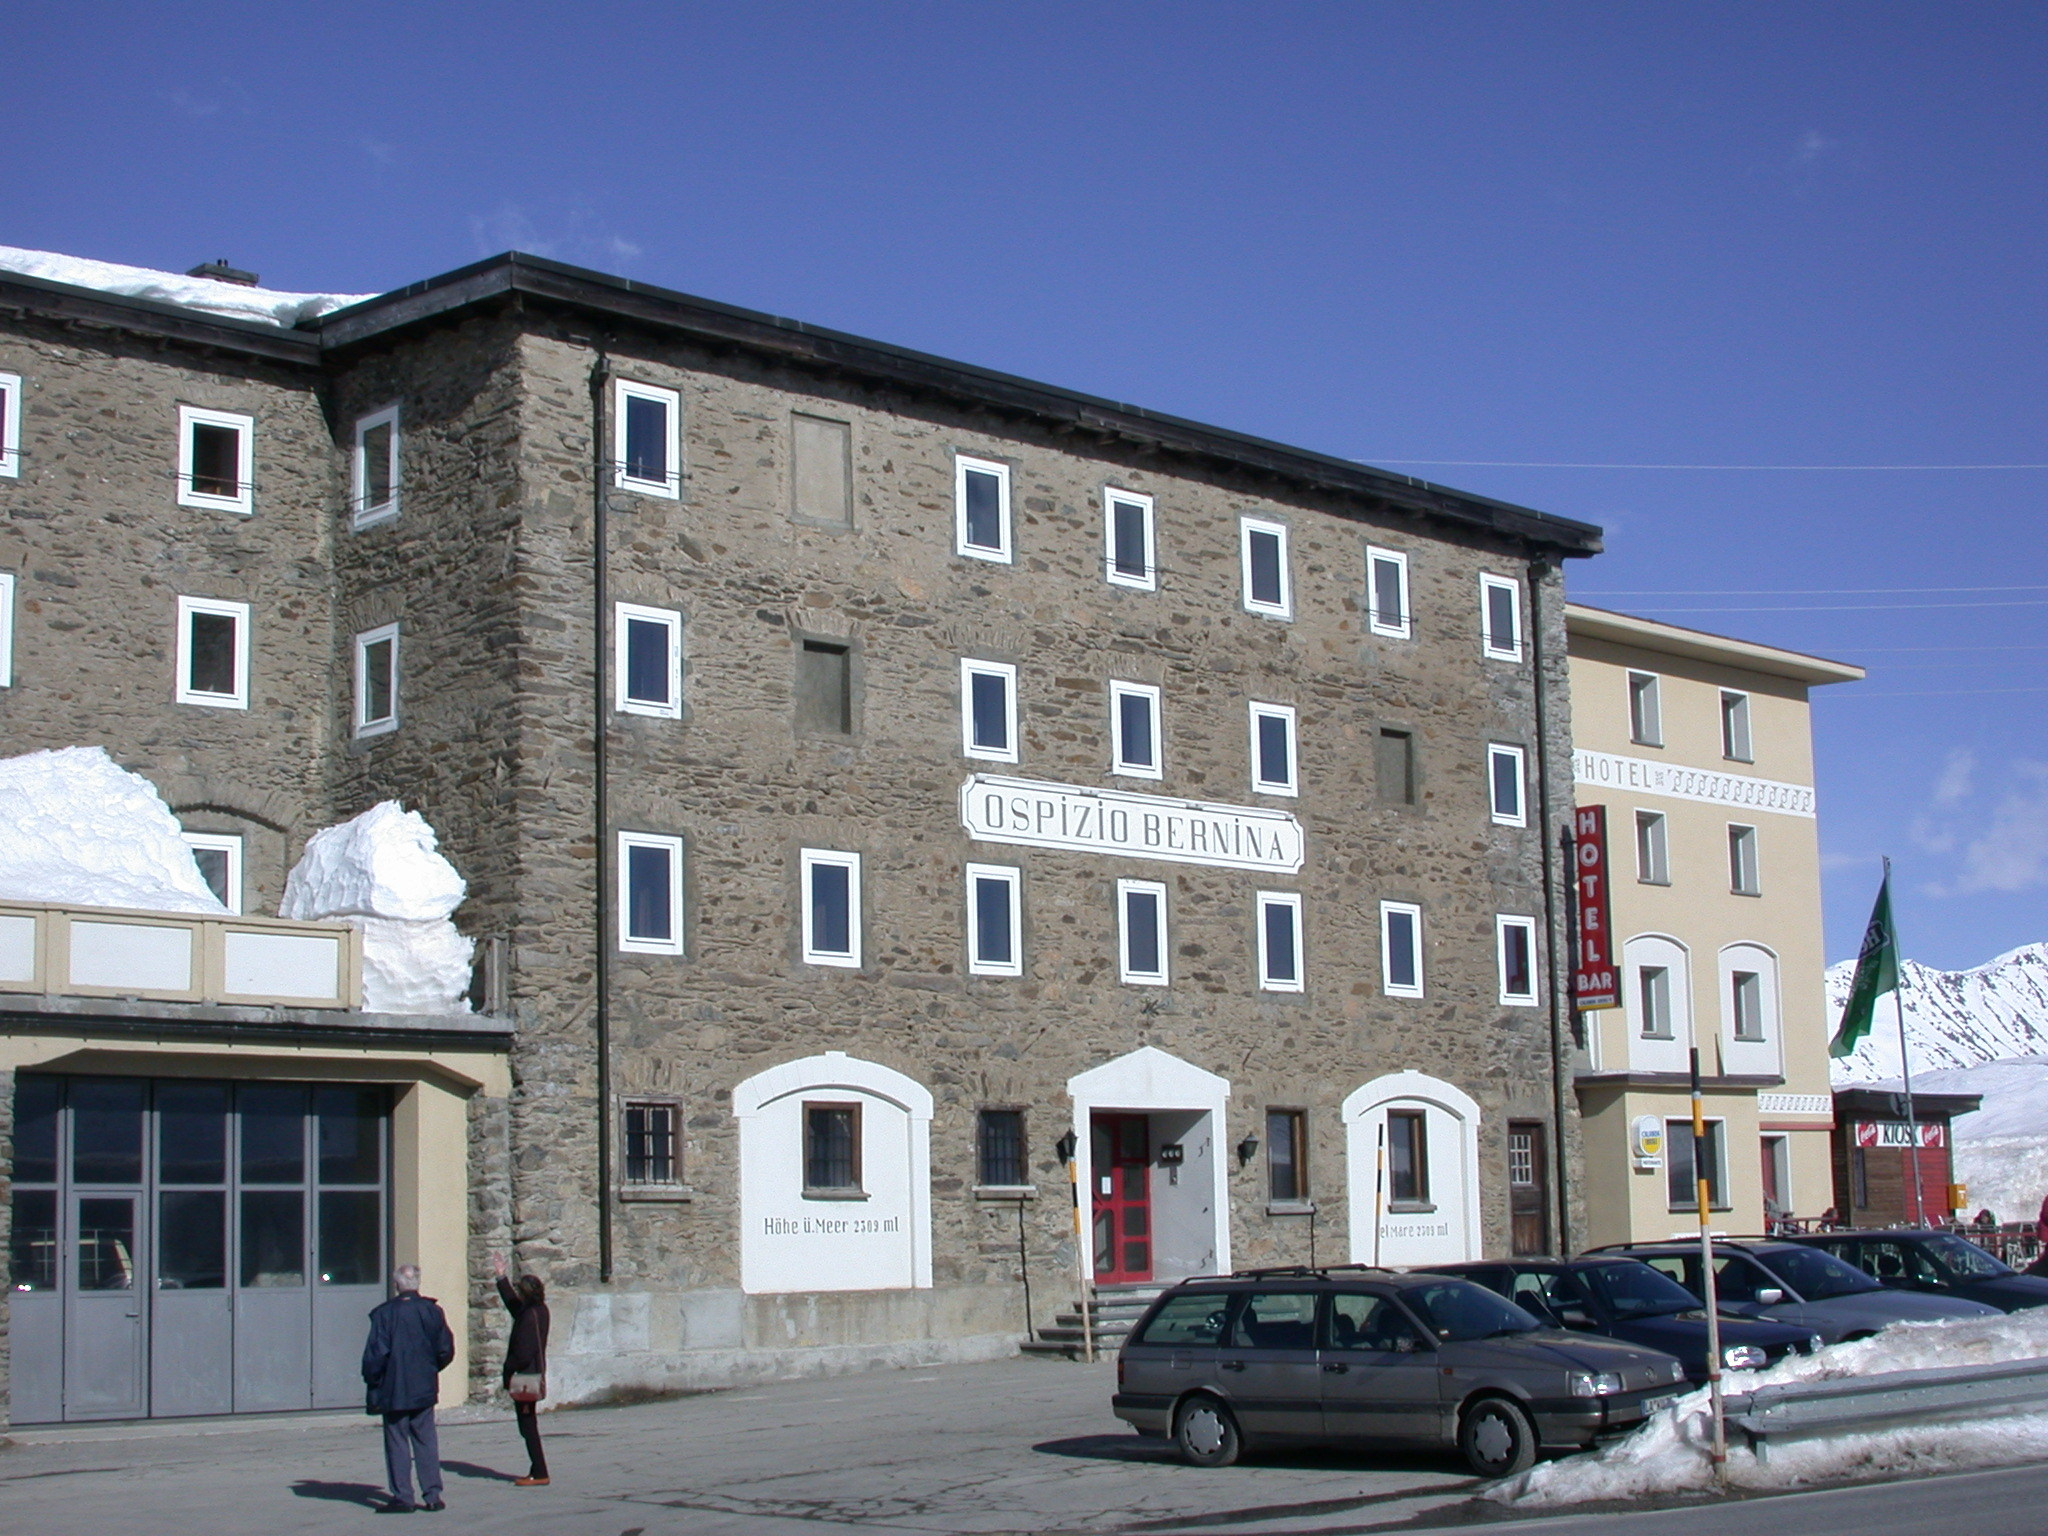 Ristorante Ospizio Bernina Slide 2